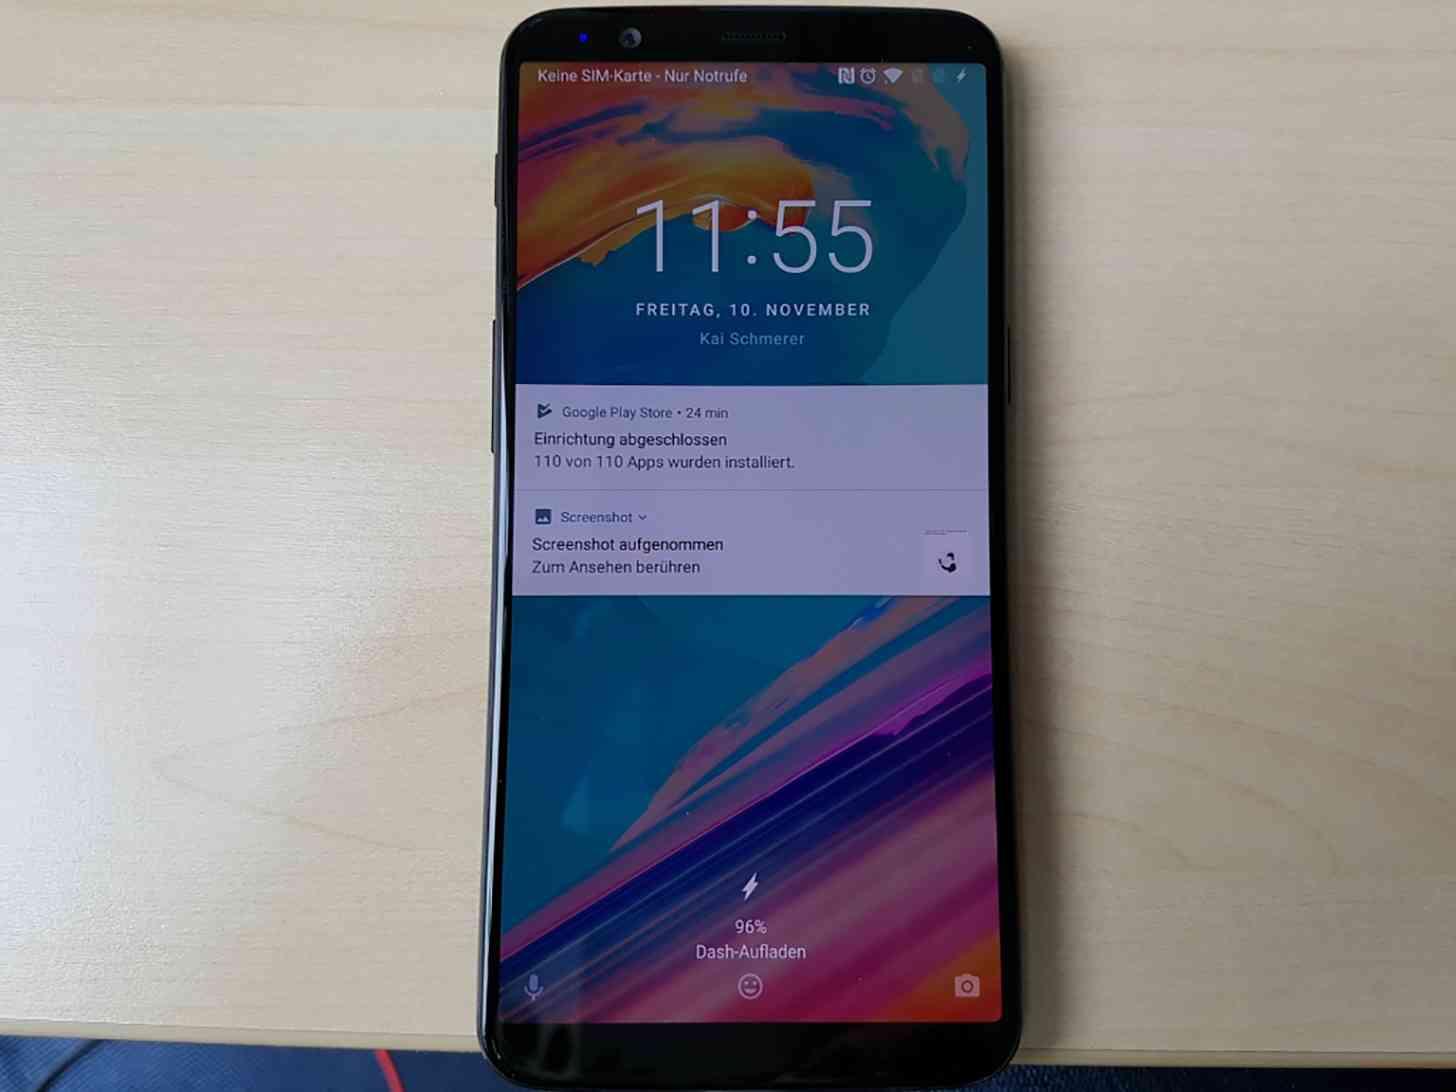 OnePlus 5T hands-on photo leak